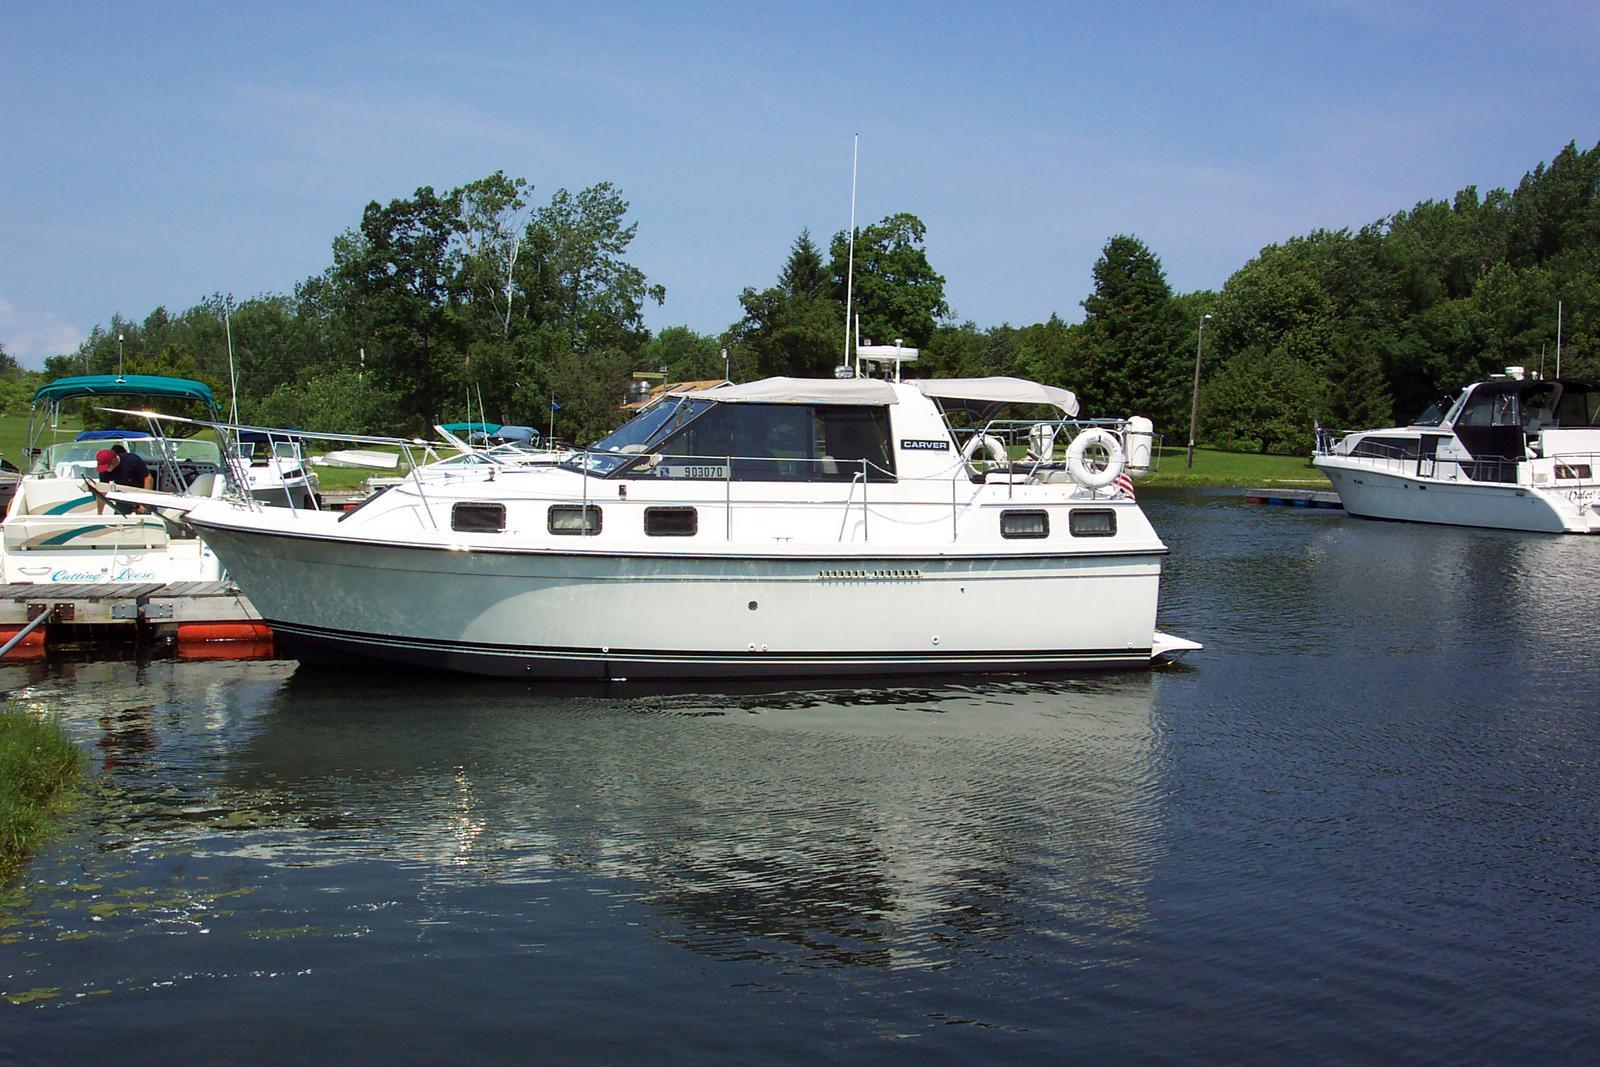 Inventory Saba Marine Colchester, VT (802) 863-1148